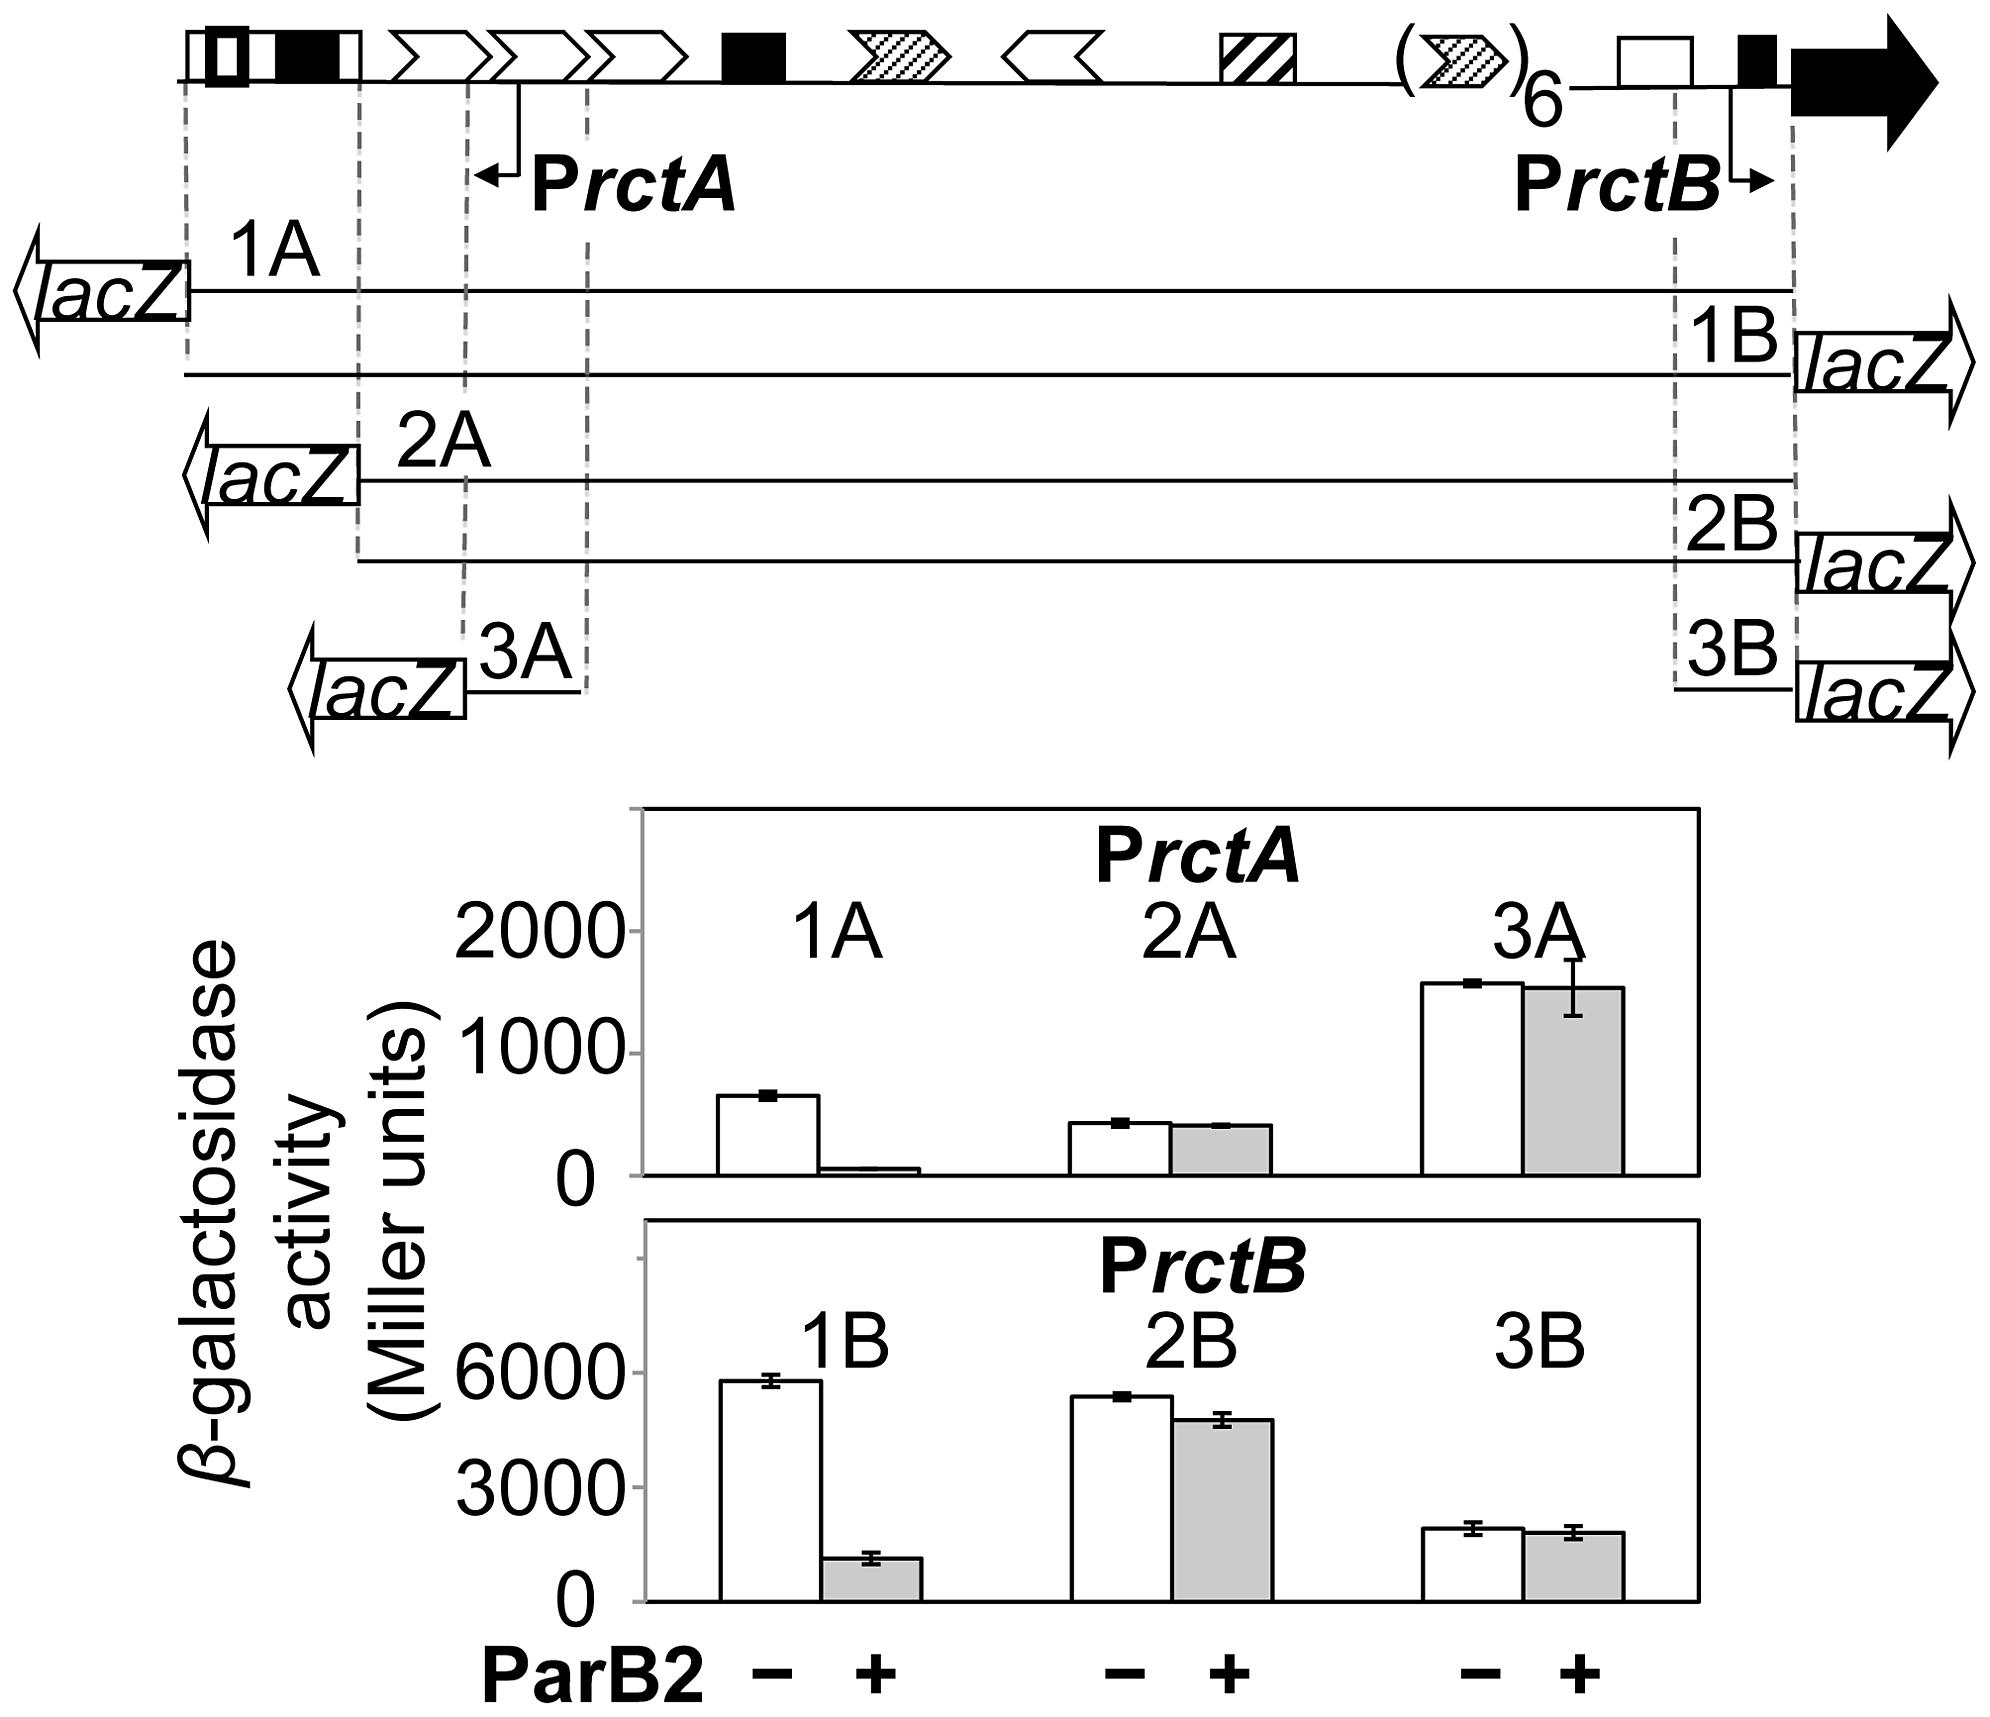 ParB2 can silence P<i>rctA</i> and P<i>rctB</i> in the presence of <i>parS2-B</i> in <i>E. coli</i>.